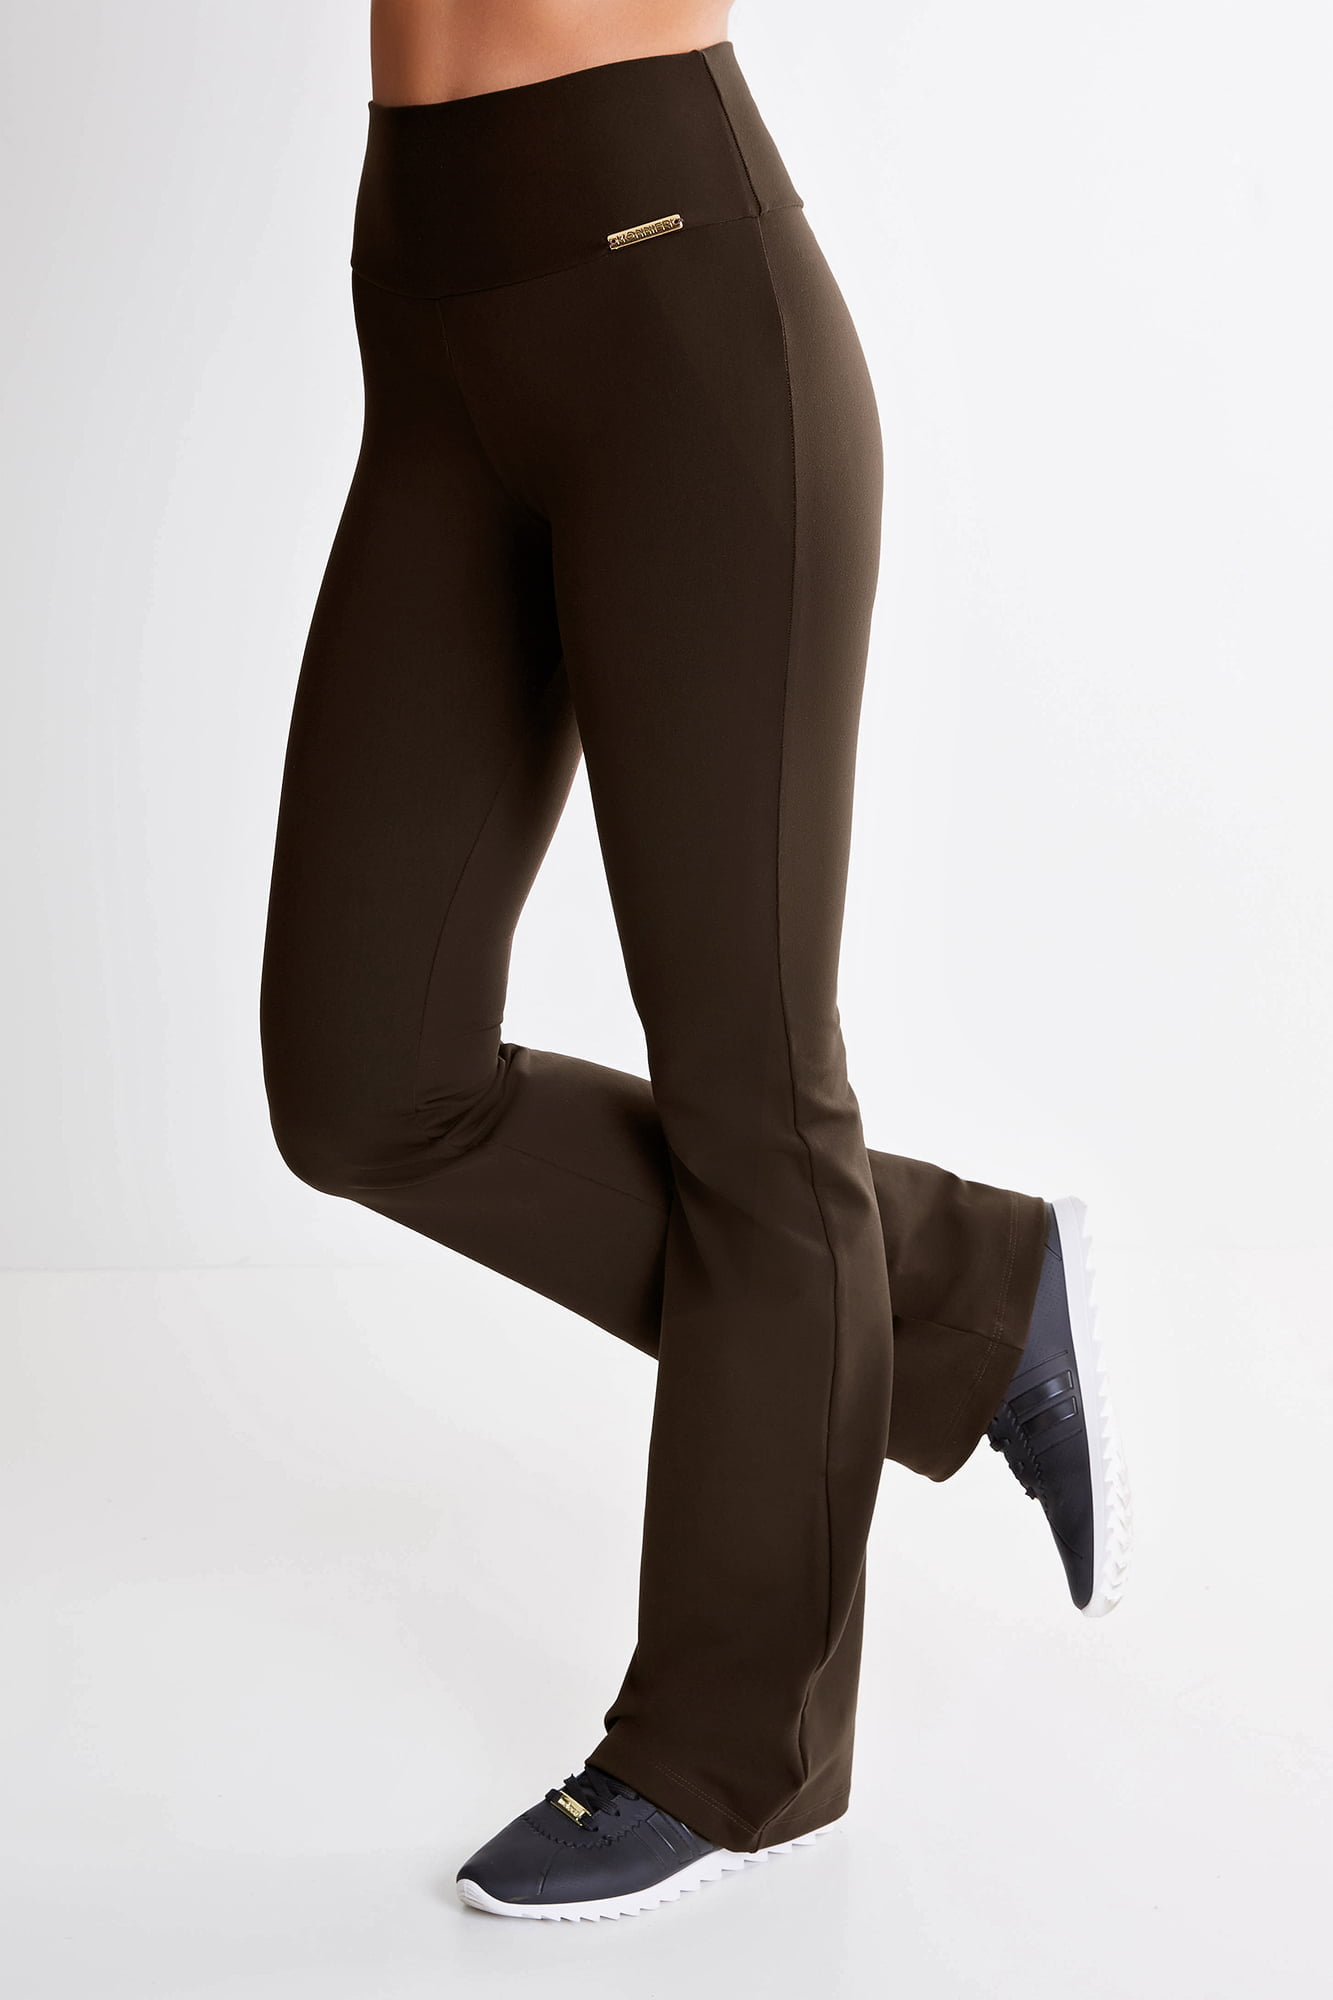 Calça Bailarina Marrom